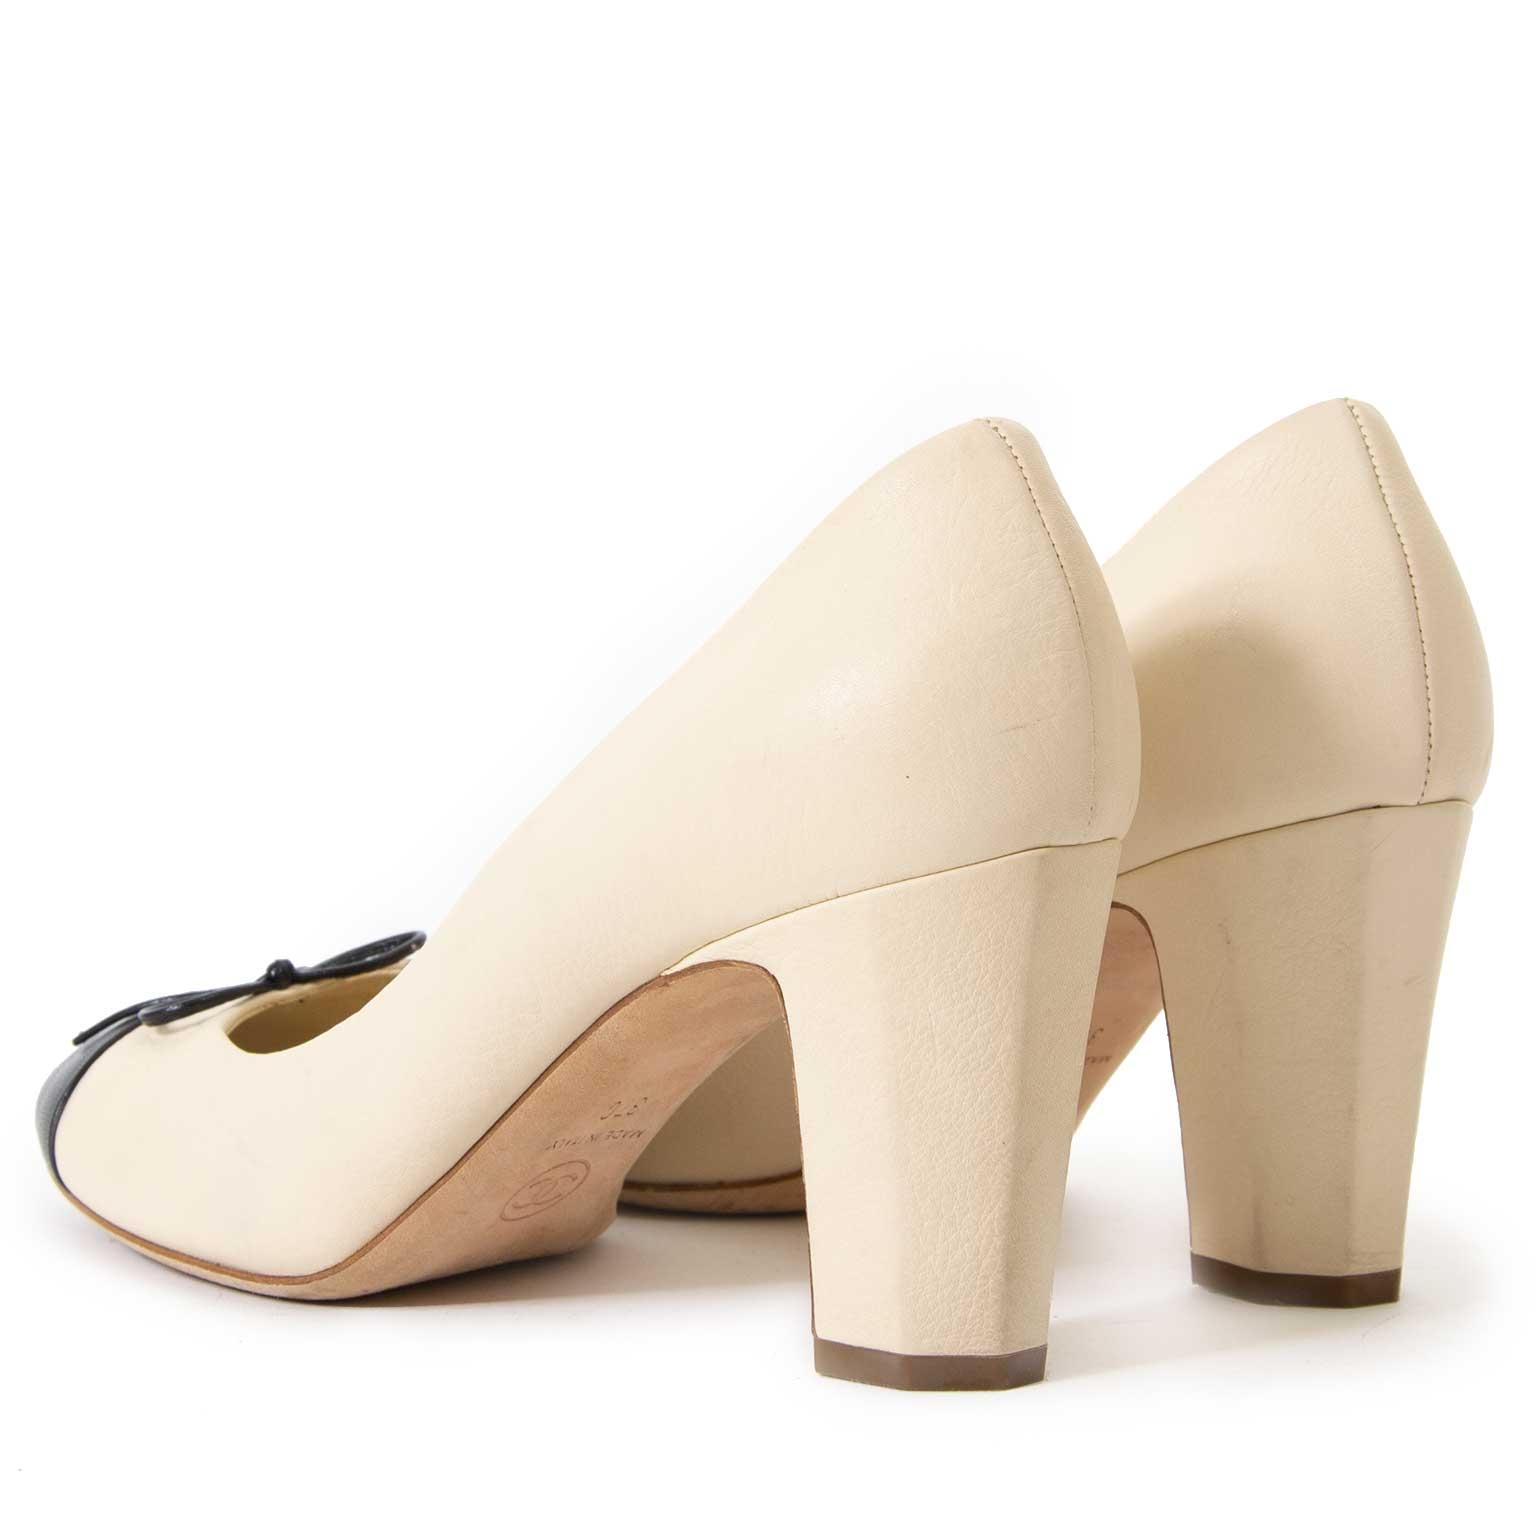 e75360e6b73e ... koop Chanel White Cap Toe Pumps - Size 37 bij labellov aan de beste  prijs